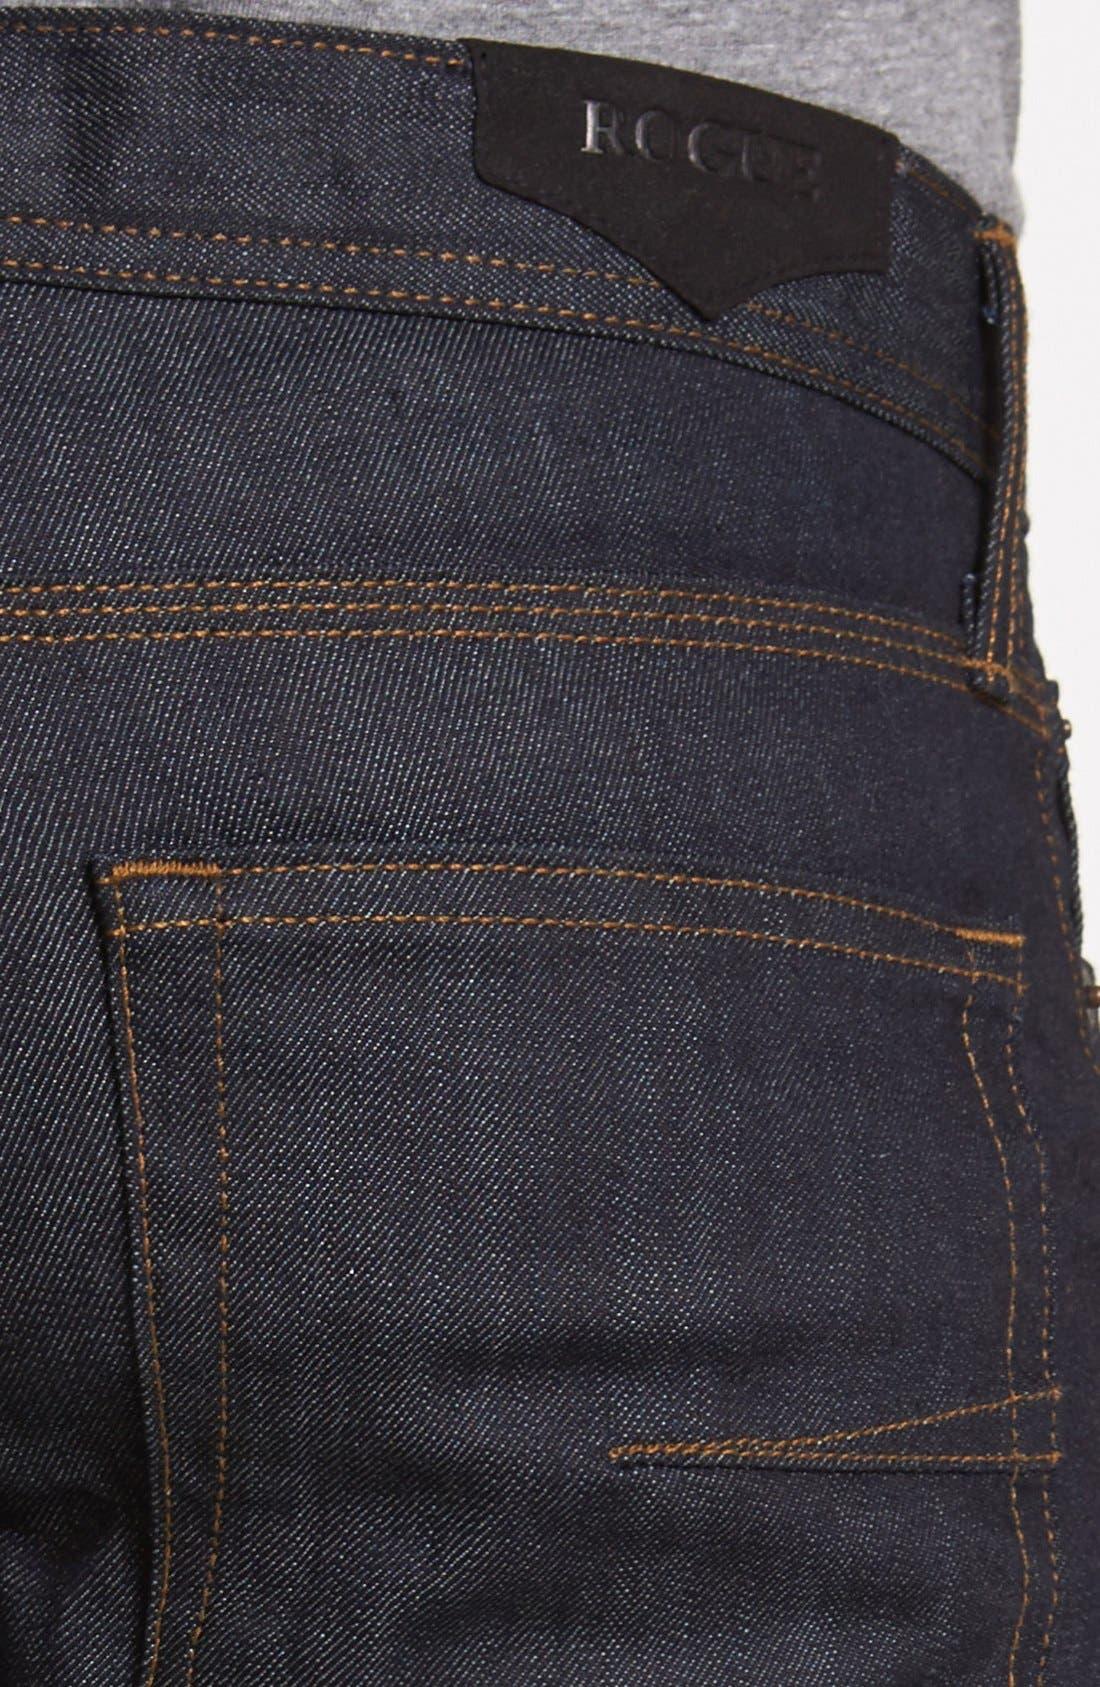 Alternate Image 4  - Rogue 'Ruffian' Slim Straight Leg Jeans (Dark Blue)